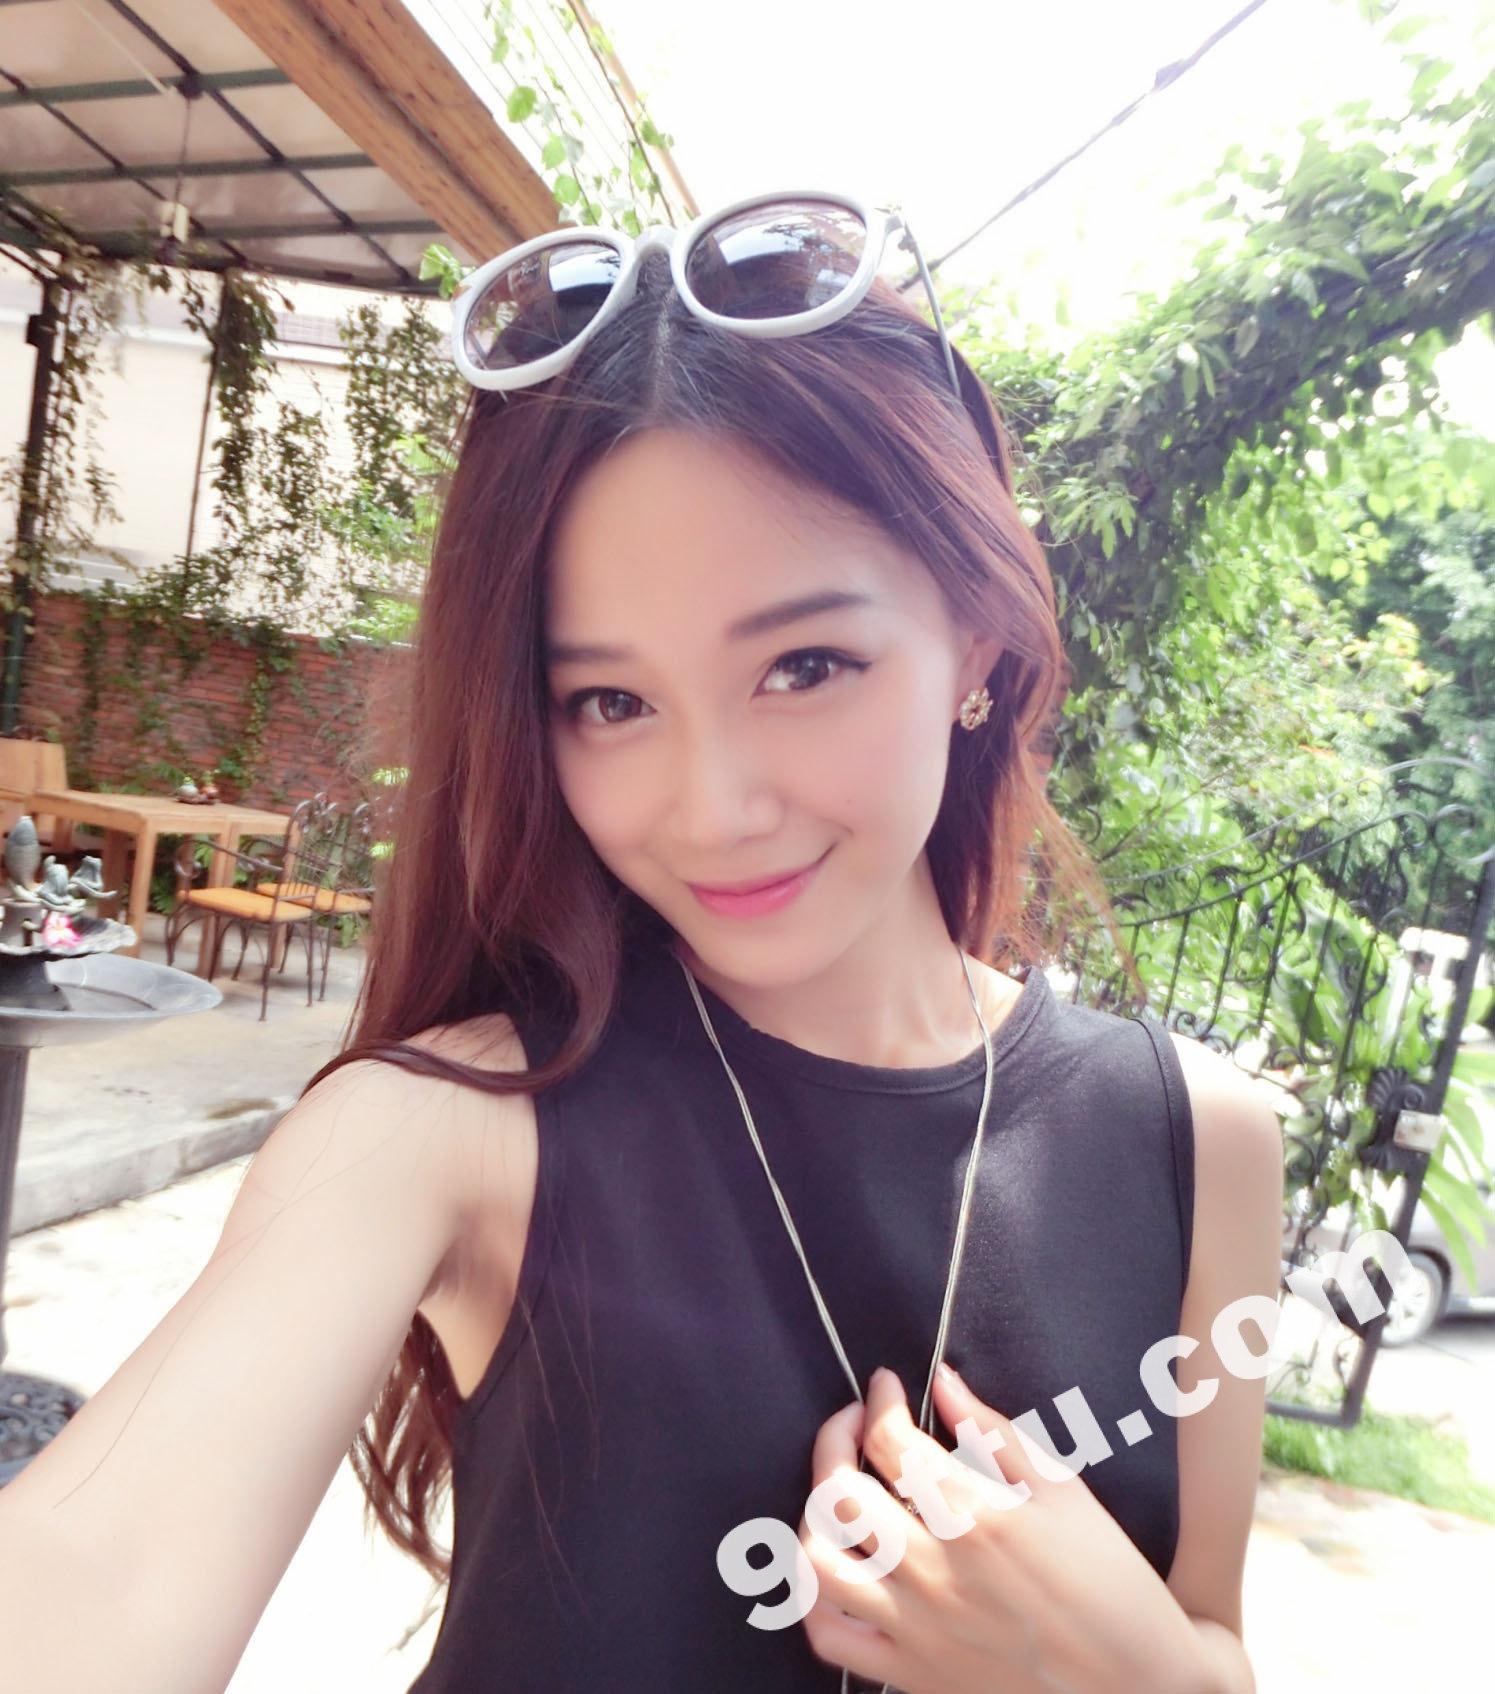 KK38 517张 时尚美女达人照片生活照-15